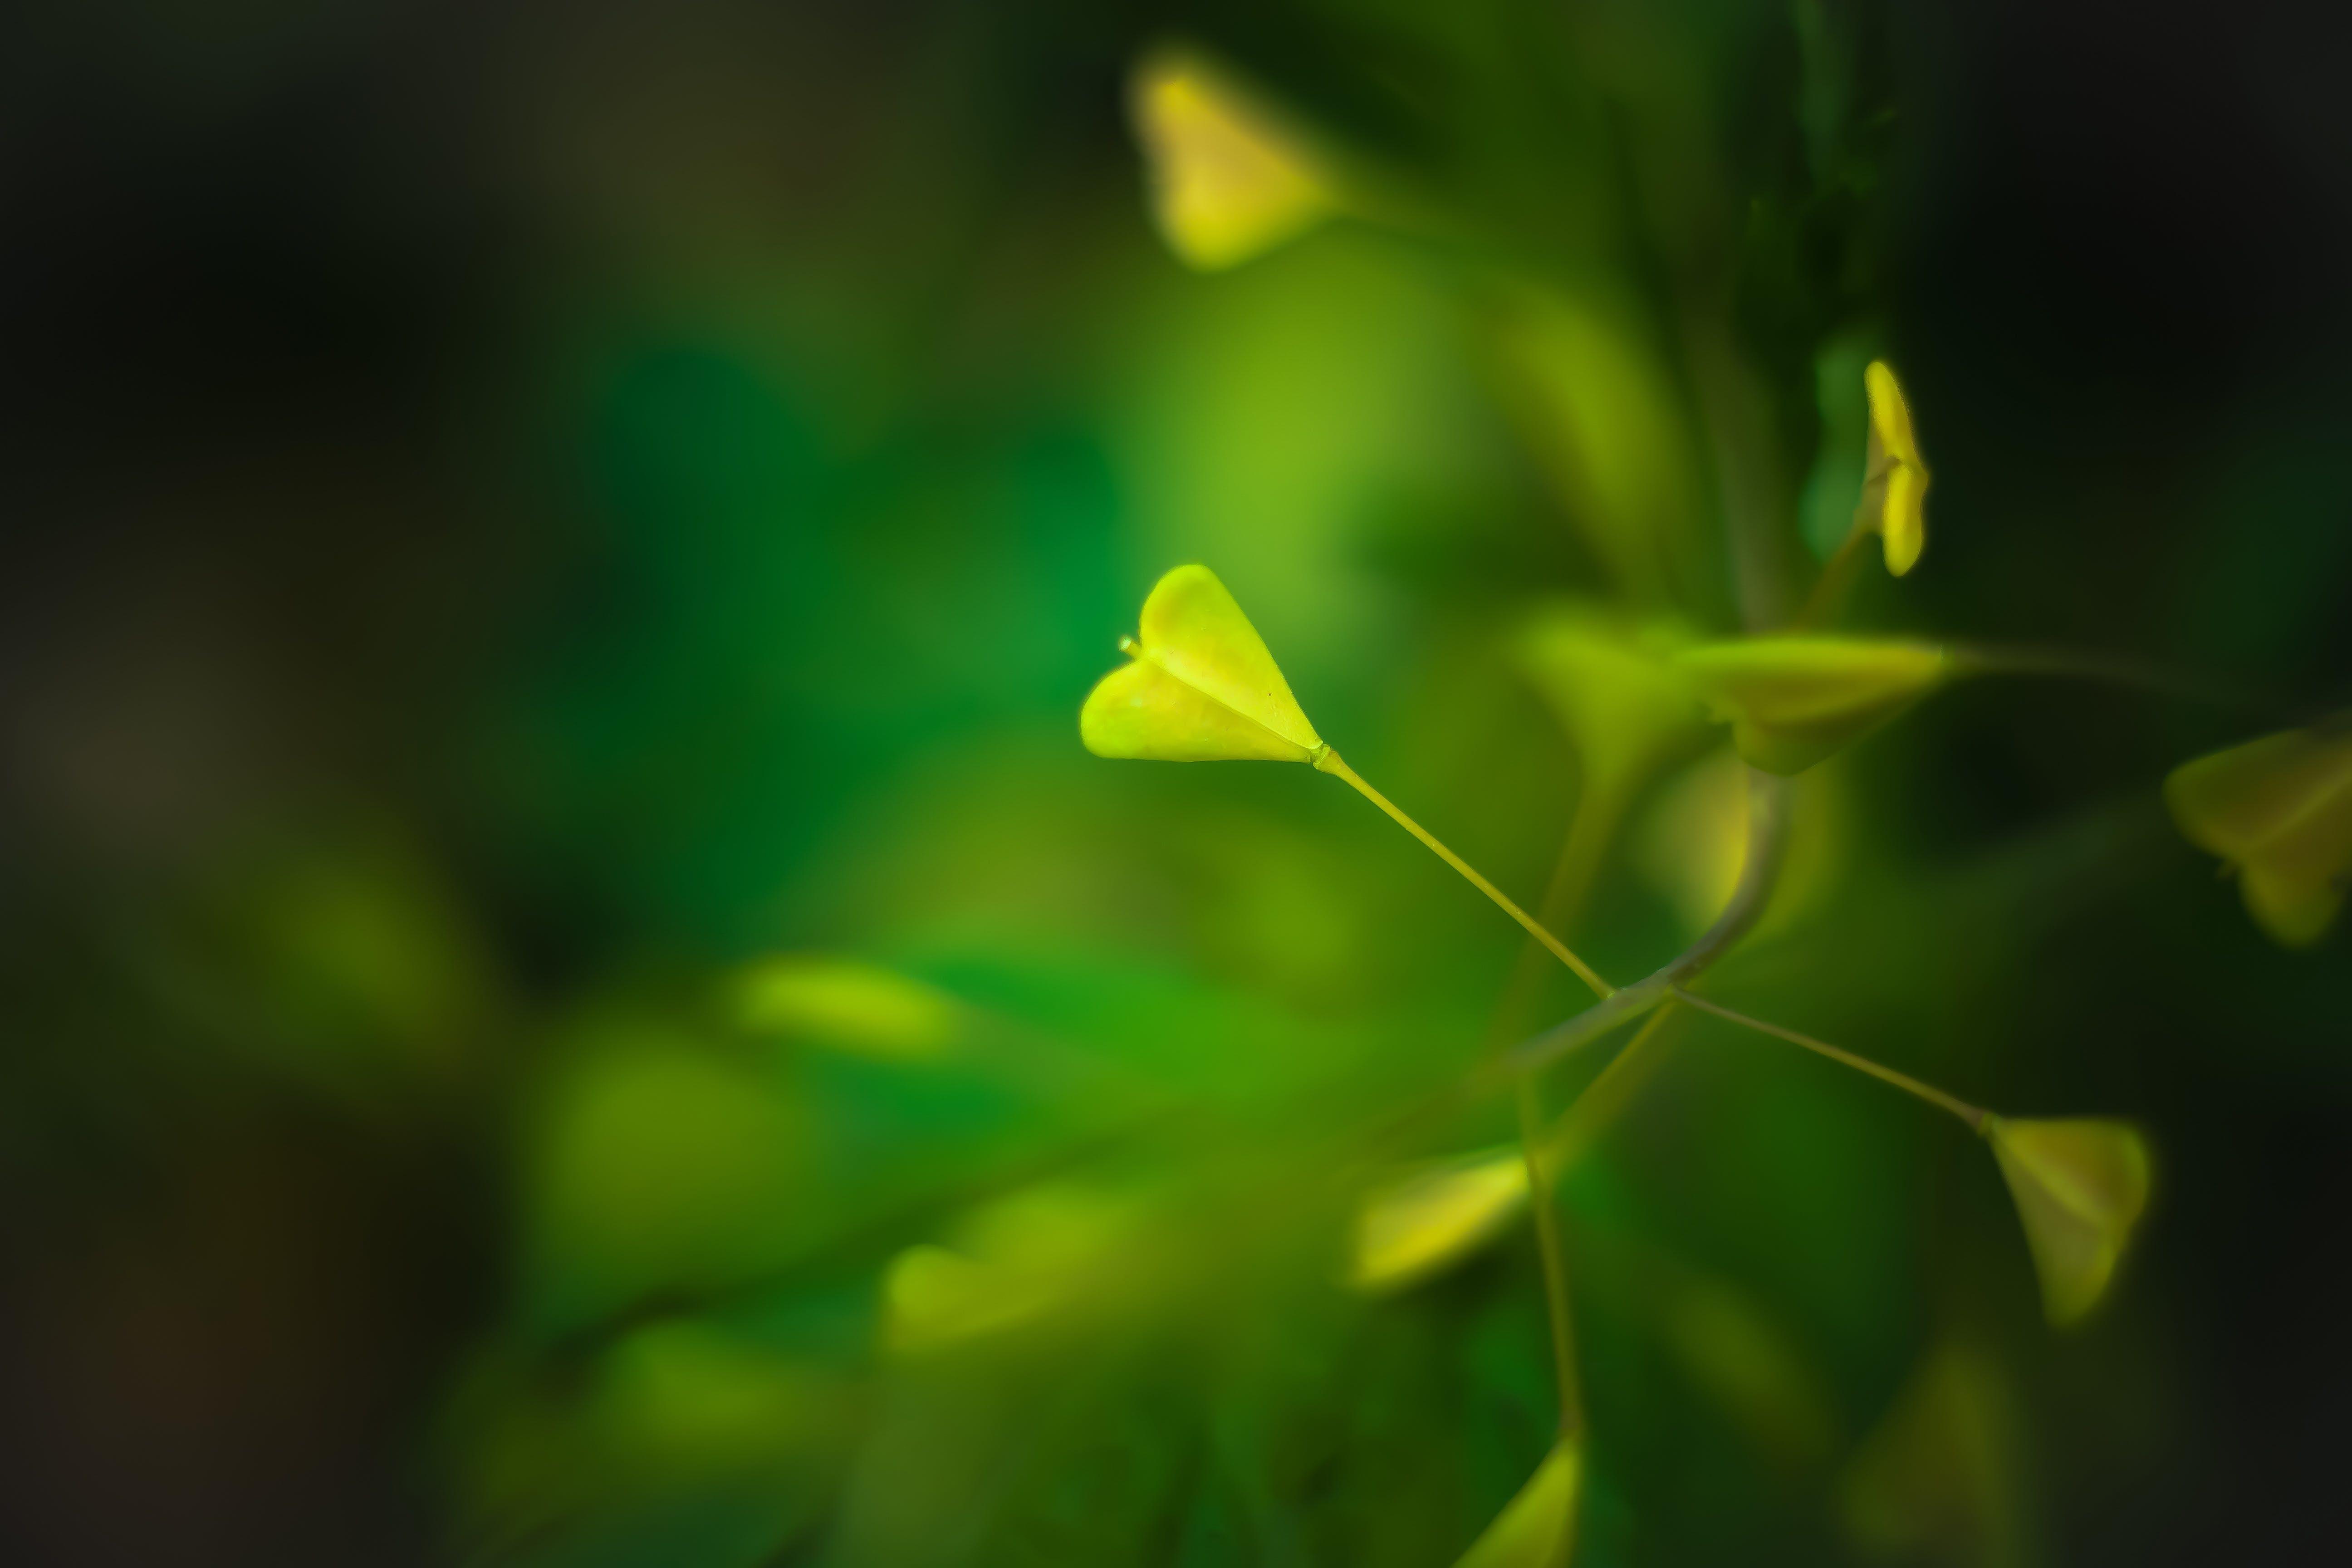 heart, nature, plant